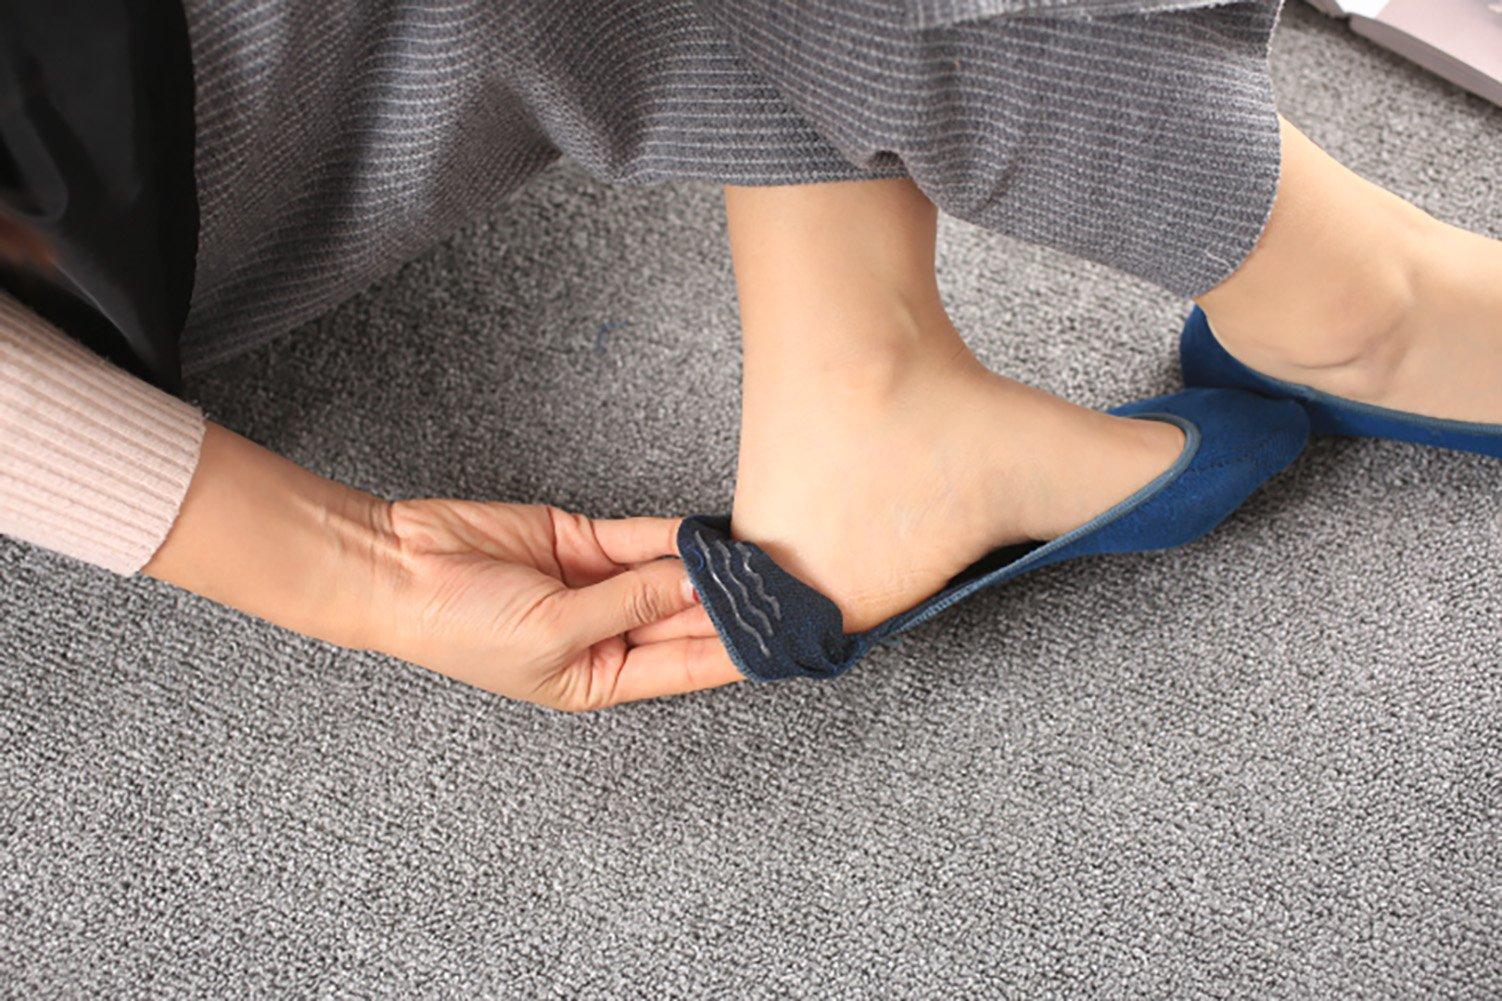 Women No Show Socks Cotton Liner Socks Non-Slip No Show Socks Low Cut Boat Socks 5-Pairs by Ayiran (Image #6)